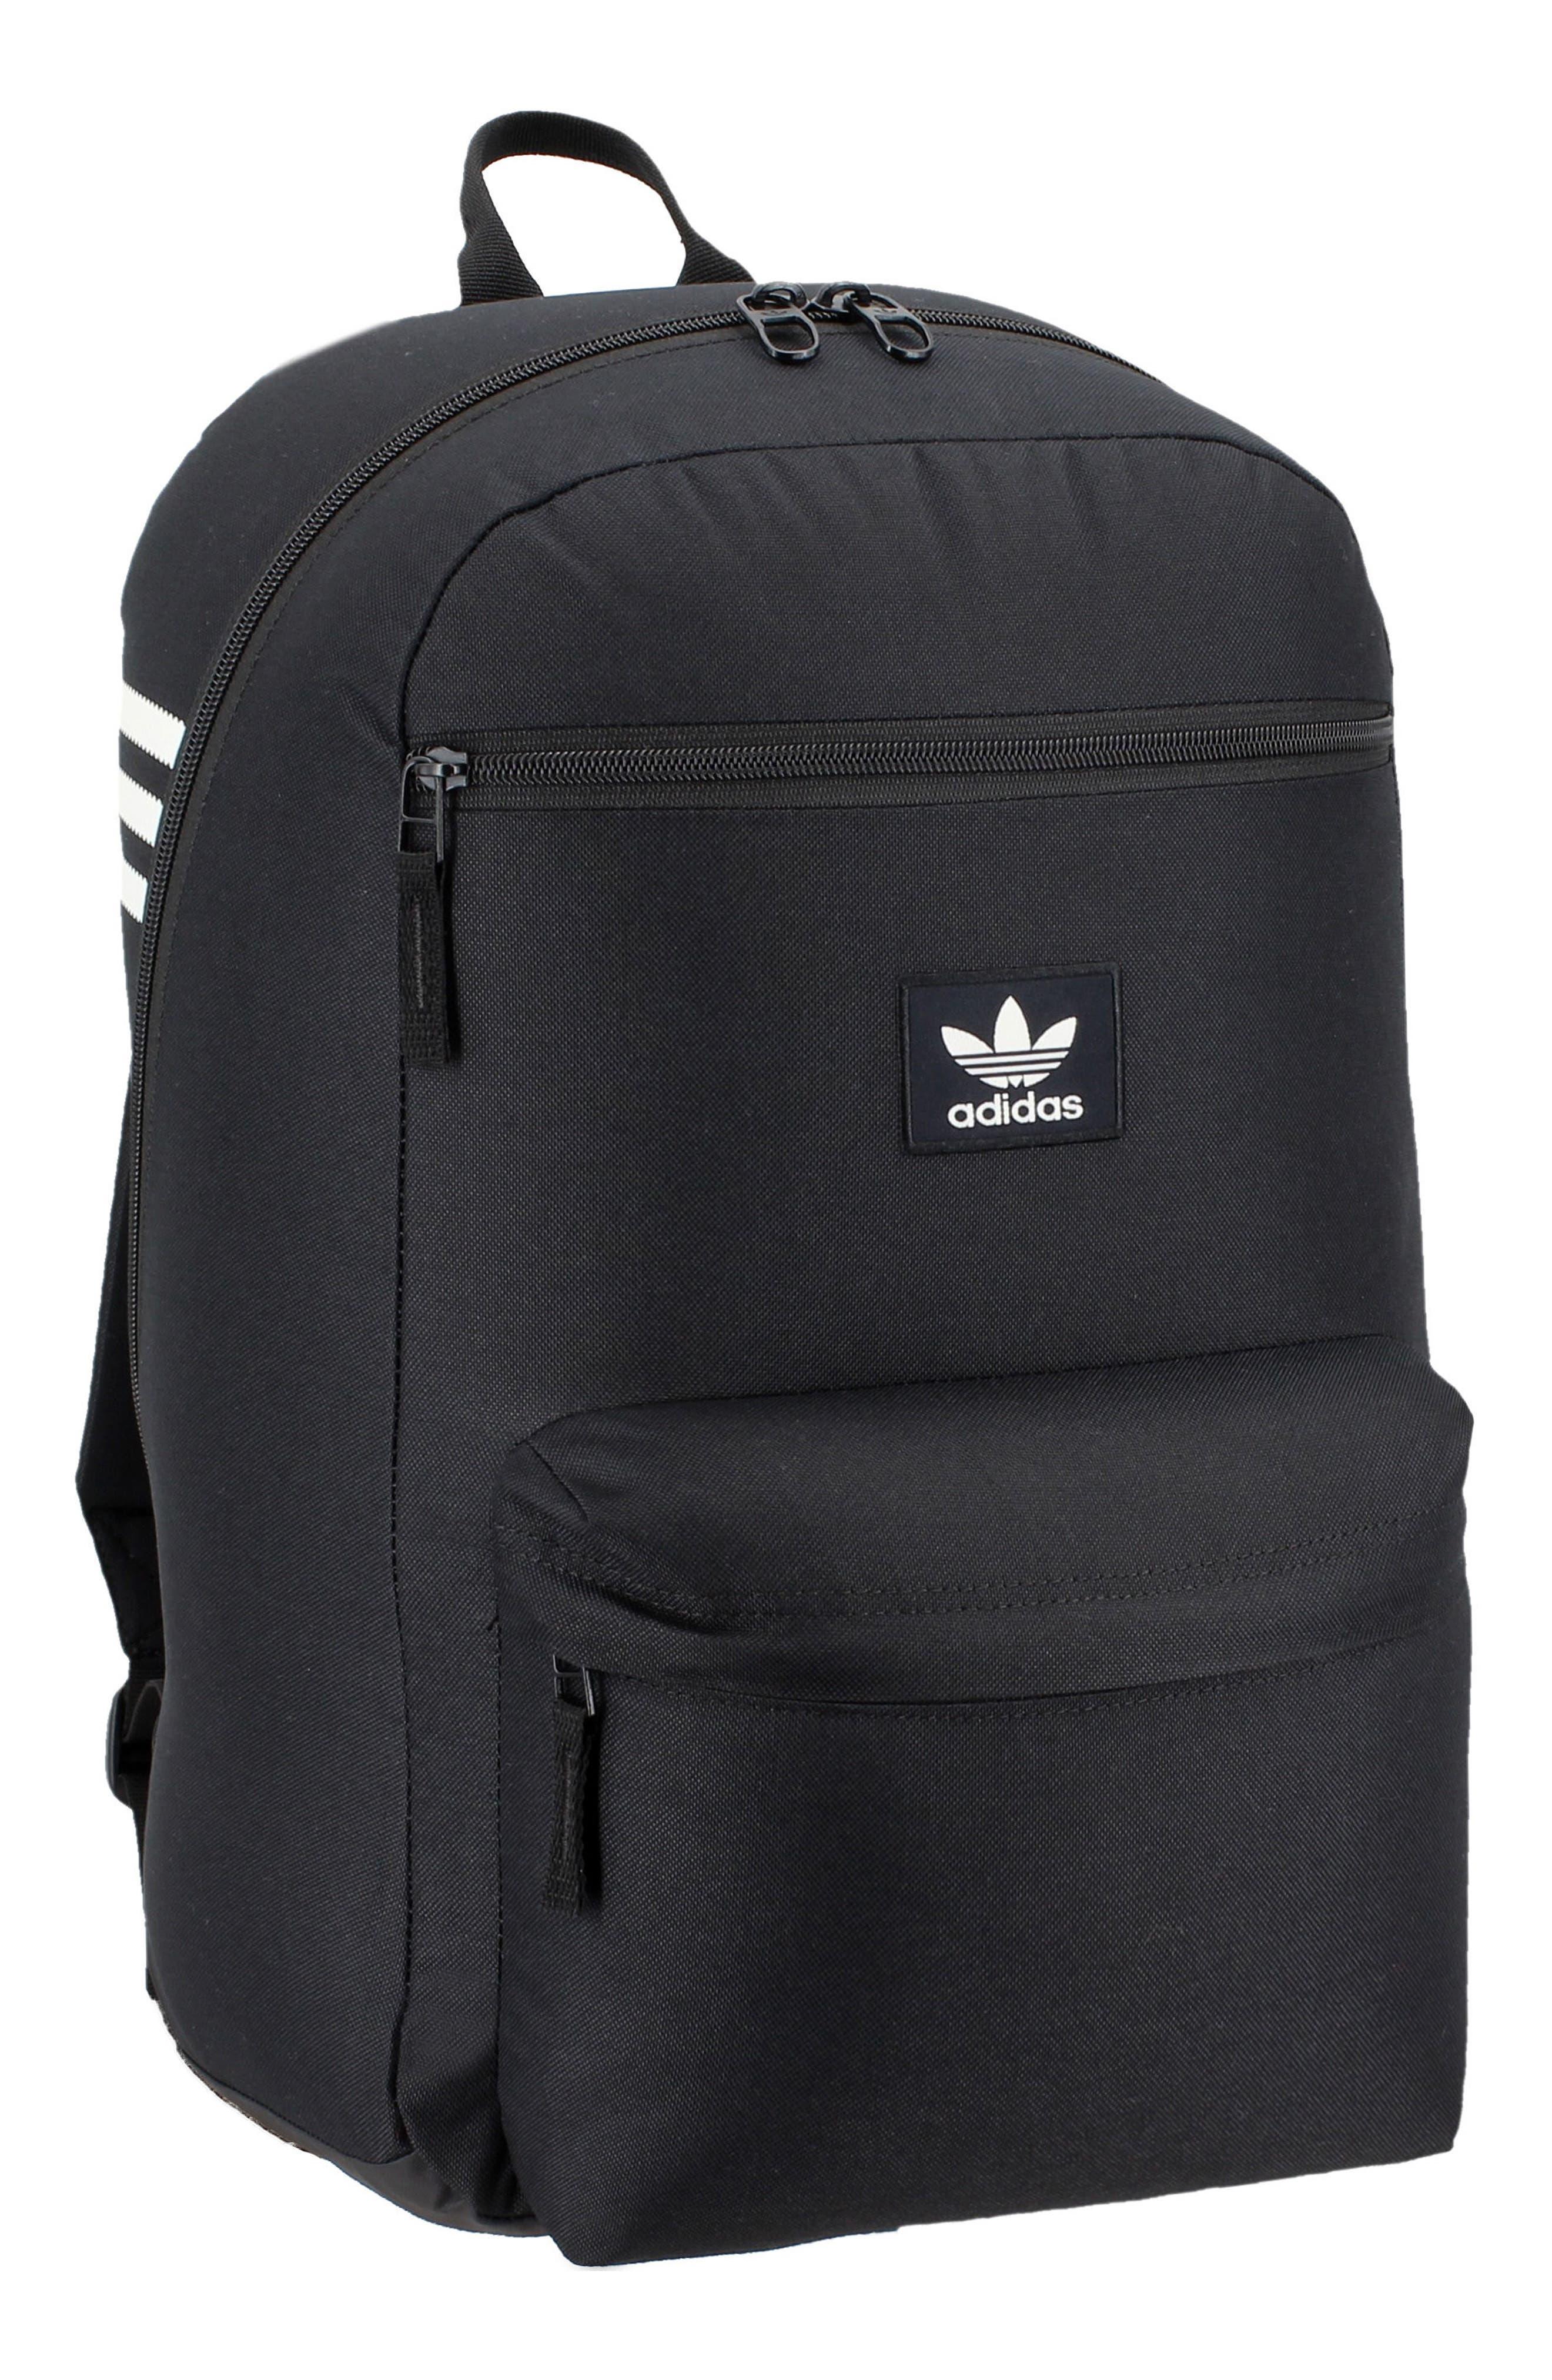 ADIDAS ORIGINALS Nationals Backpack, Main, color, BLACK